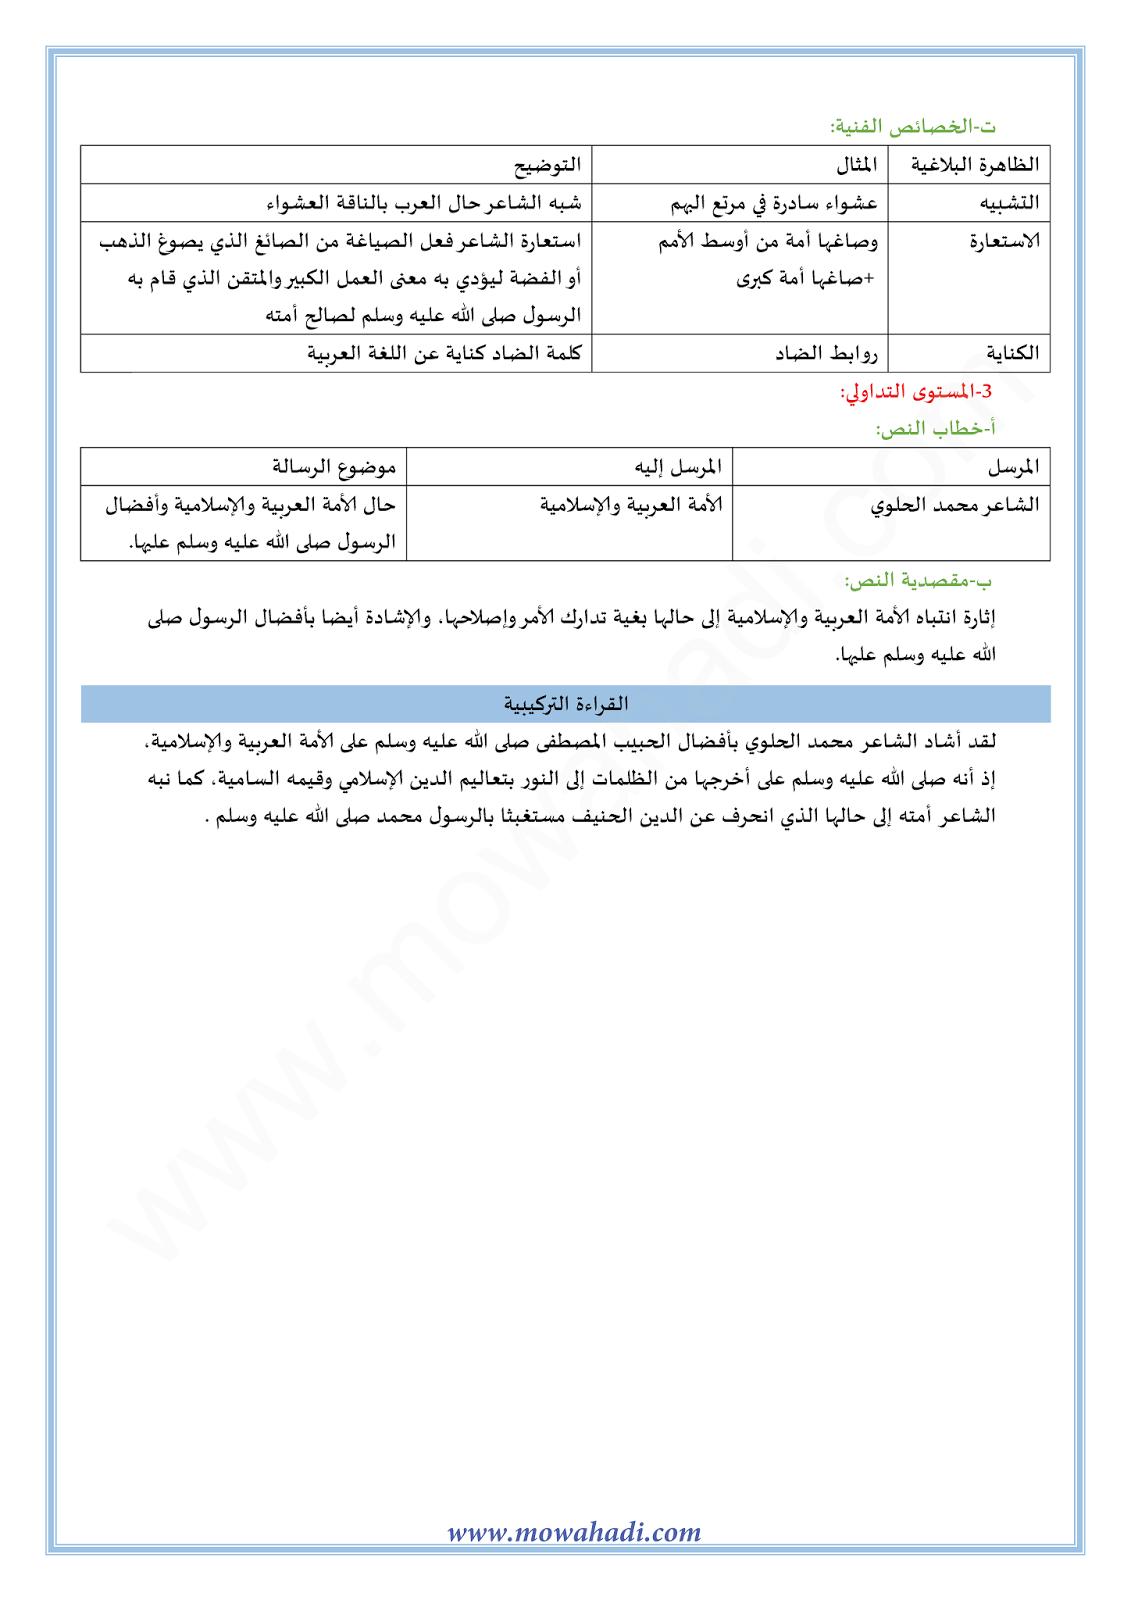 بــــــــــــــــردة2